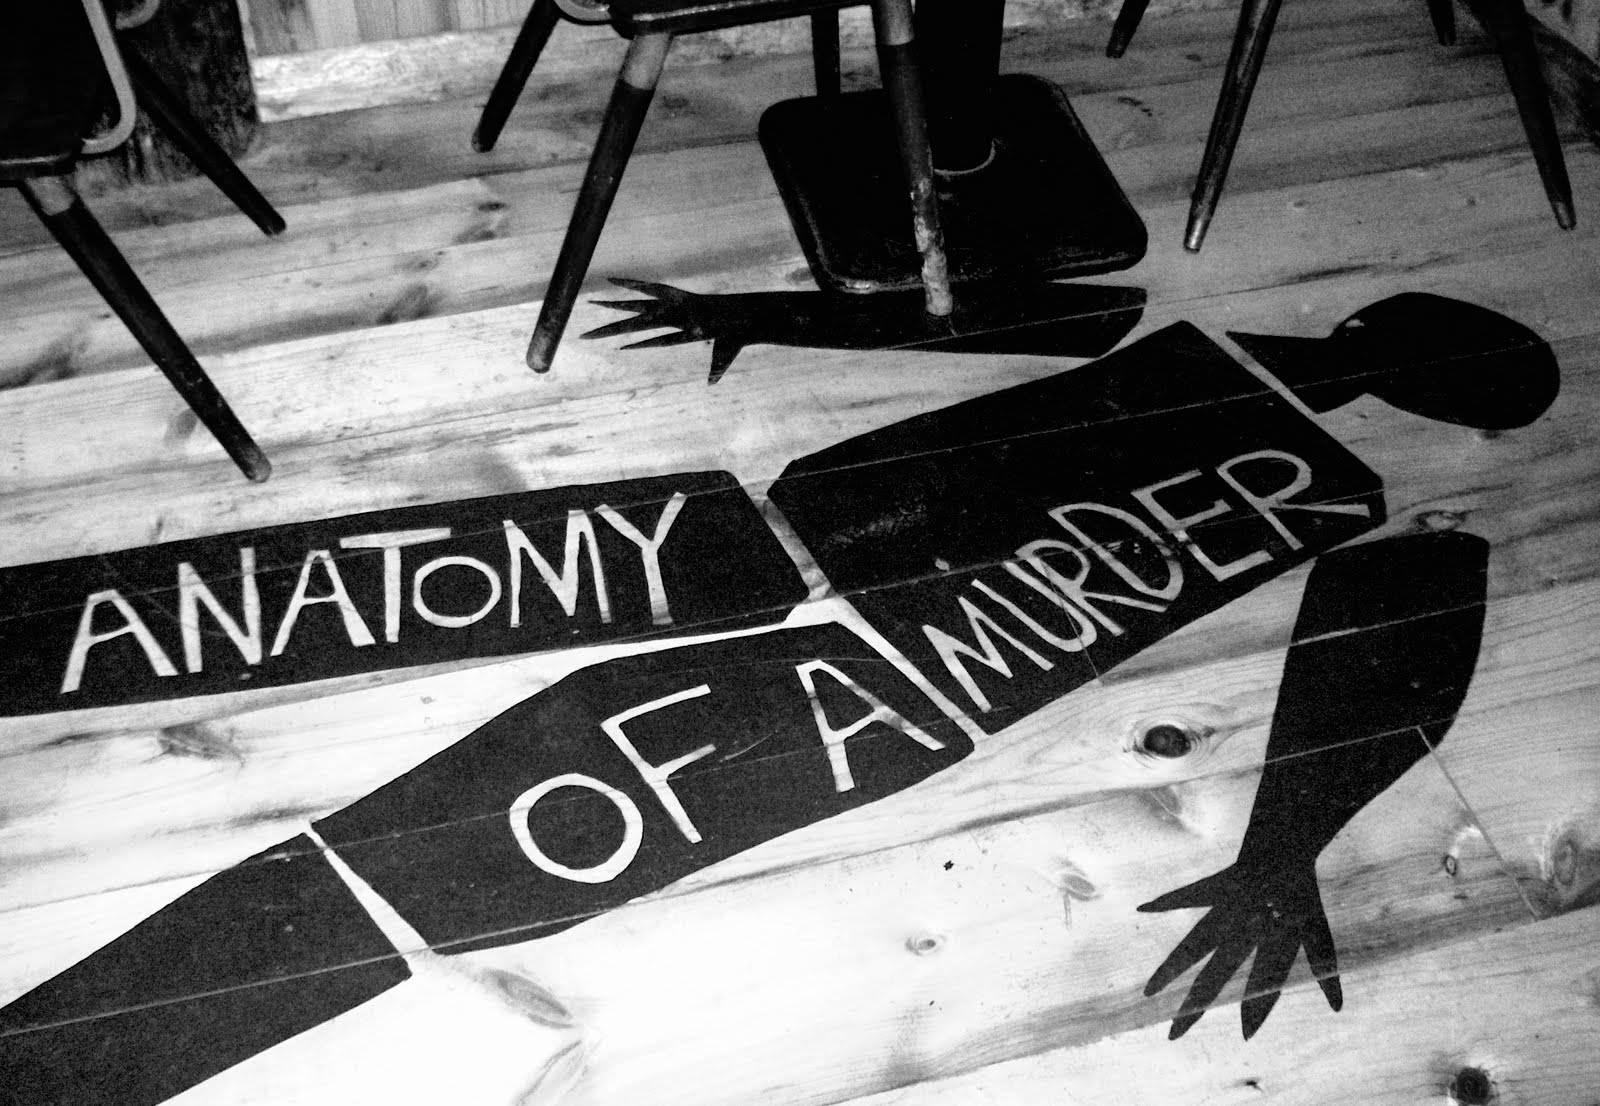 ANATOMÍA DE UN ASESINATO – Anatomy of a murder (1959) de Otto Preminger